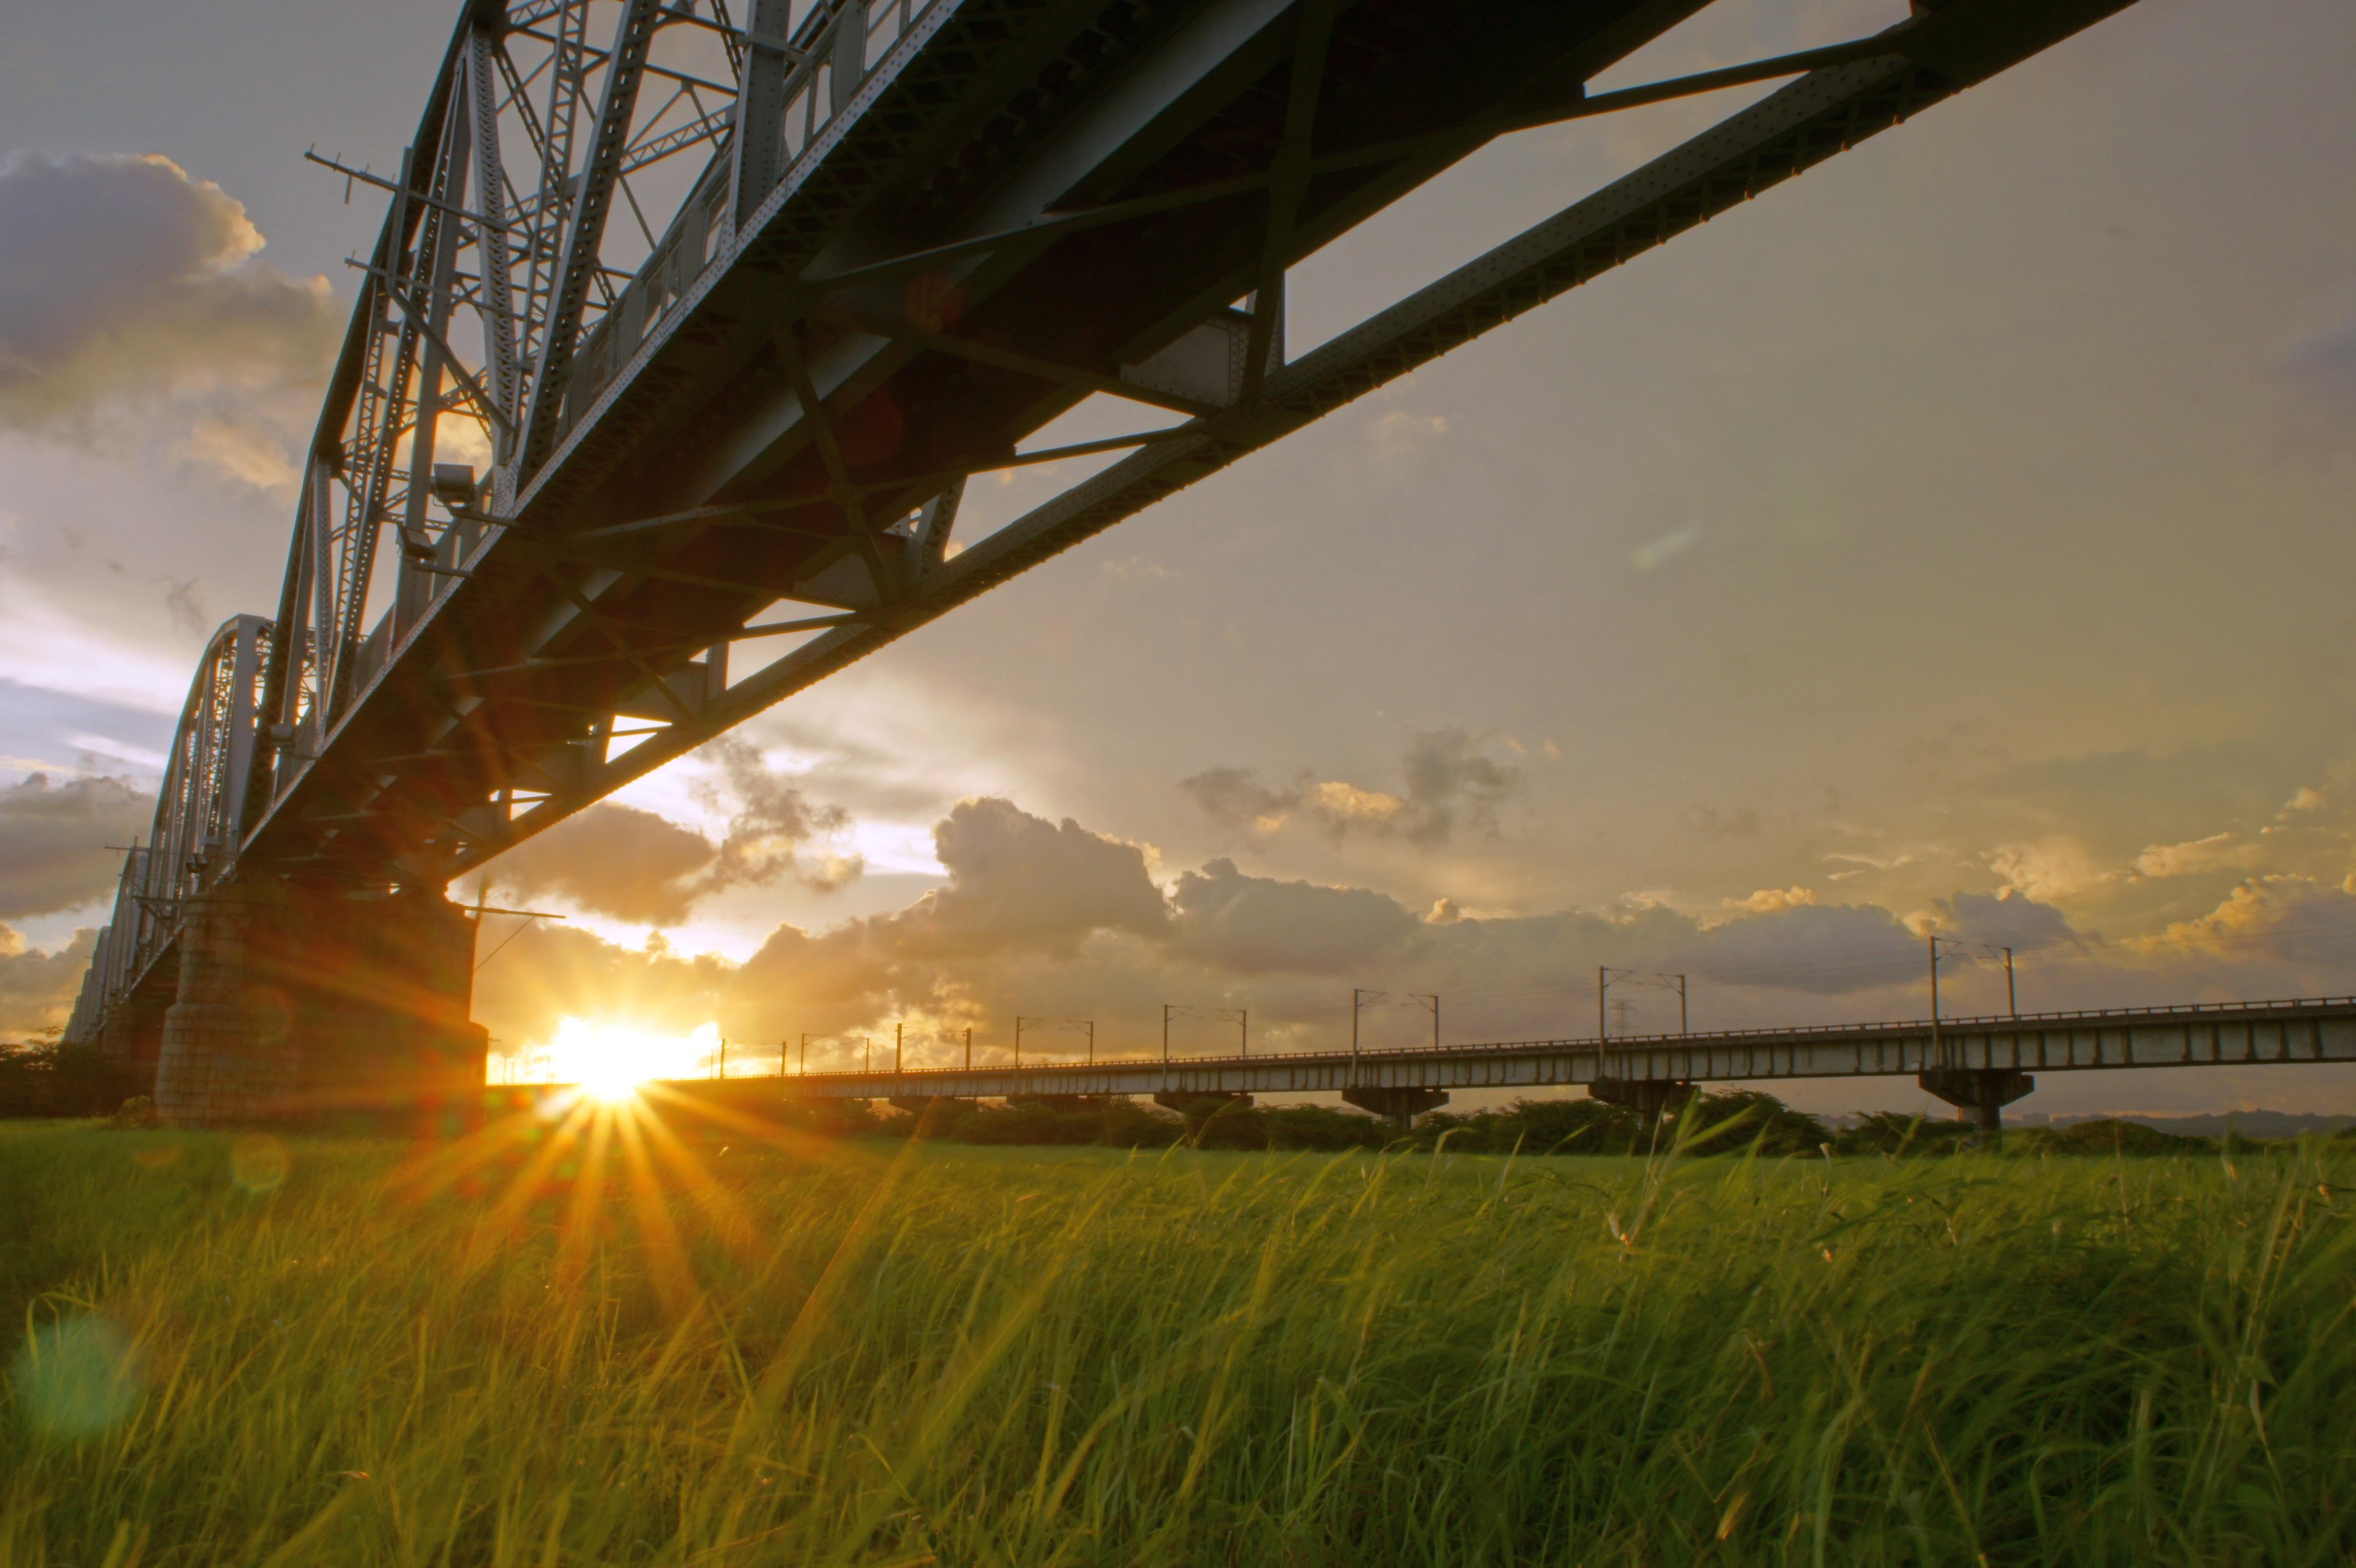 File:高屏溪「舊鐵橋」夕照.JPG - 維基百科。自由的百科全書